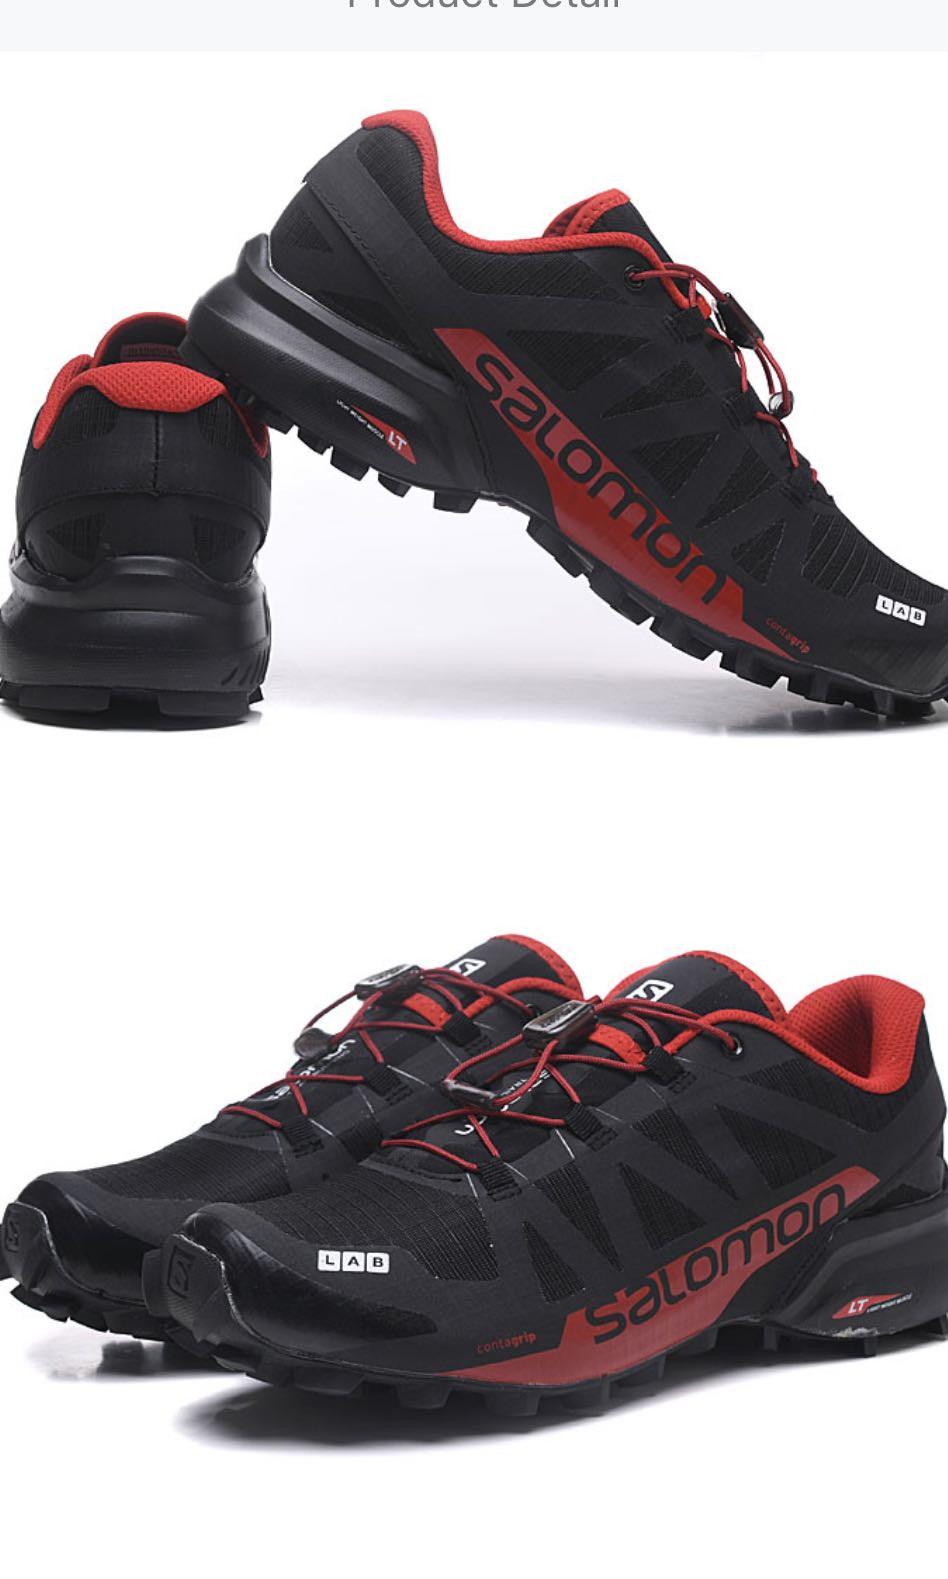 1cf66a79841f Salomon S-Lab Speedcross trail running shoe